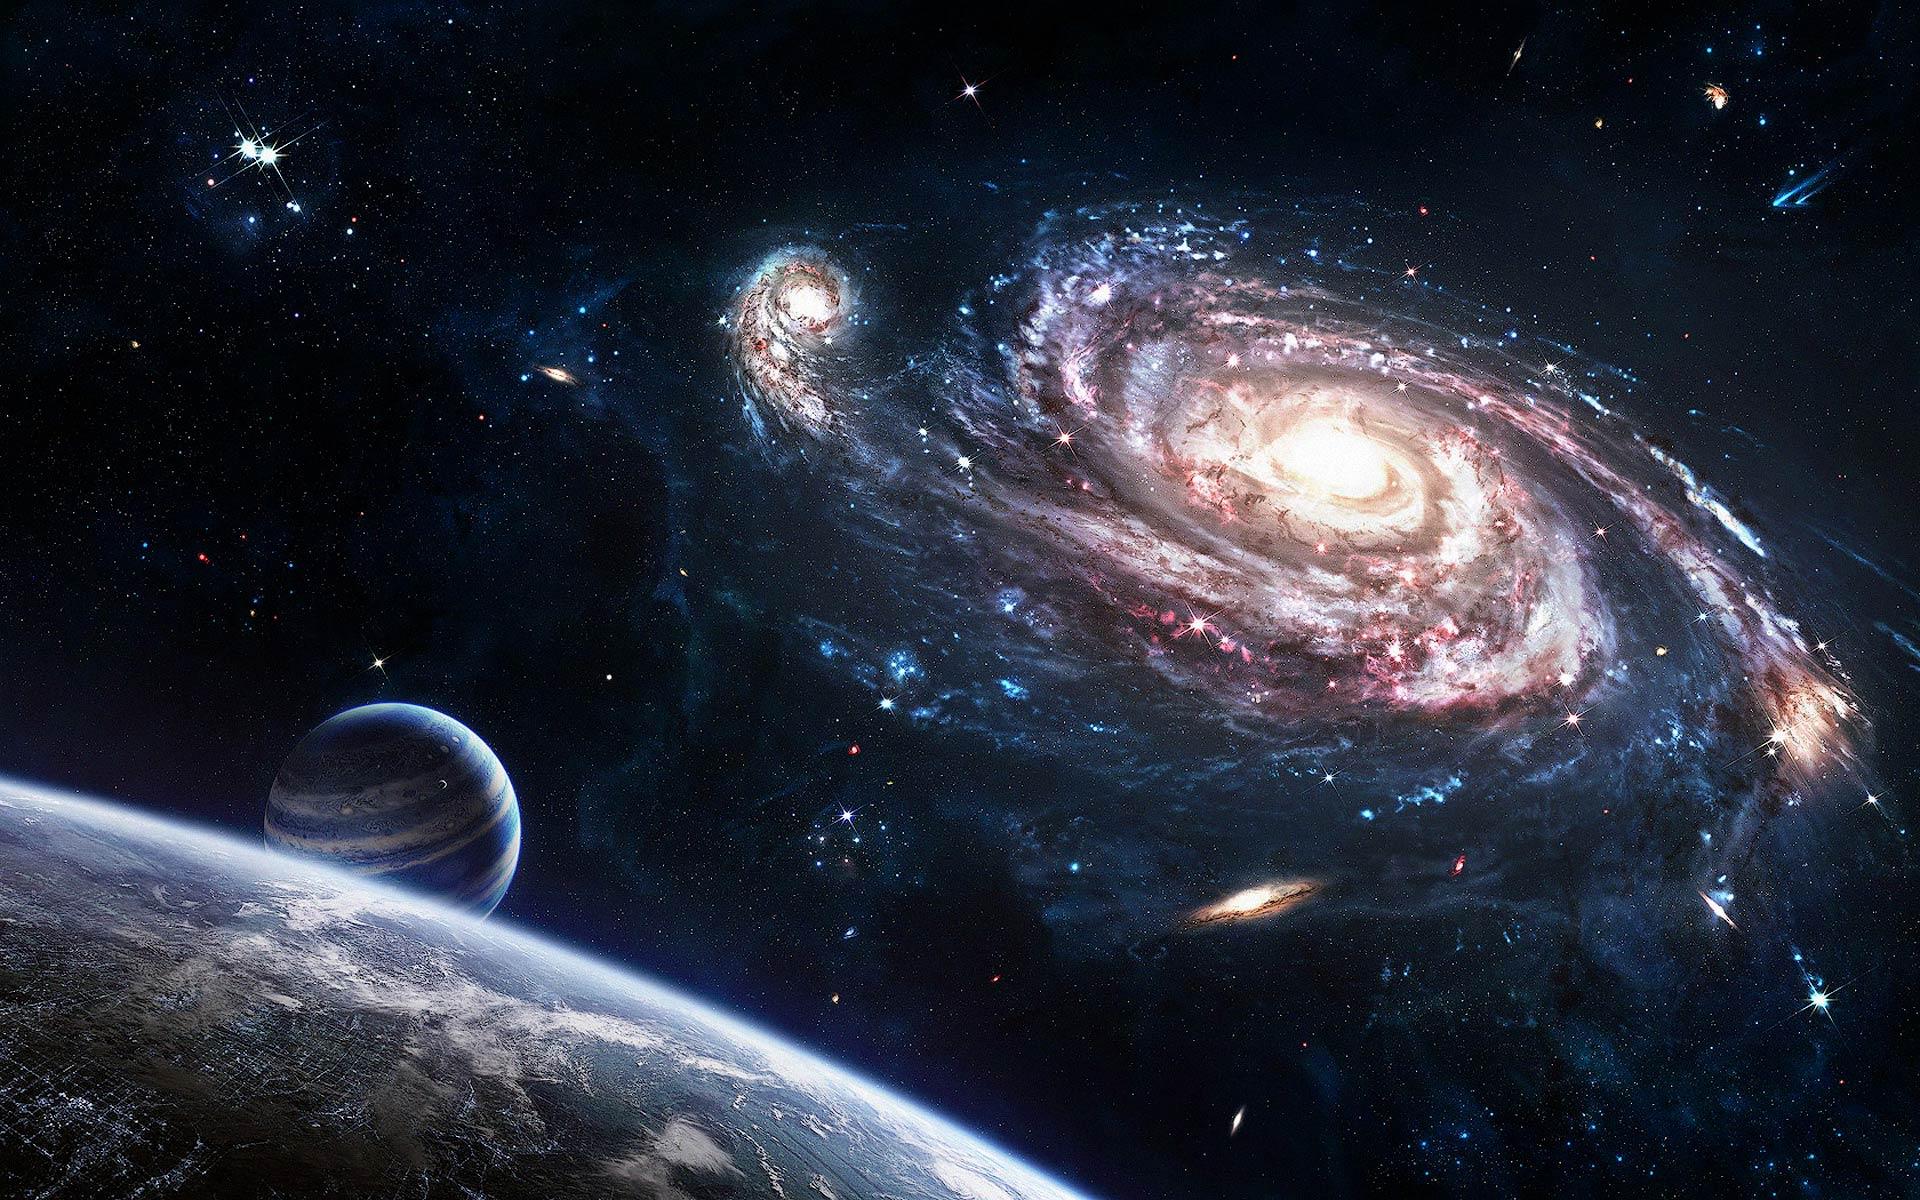 Sci-fi Spiral Galaxy Side View Space Art